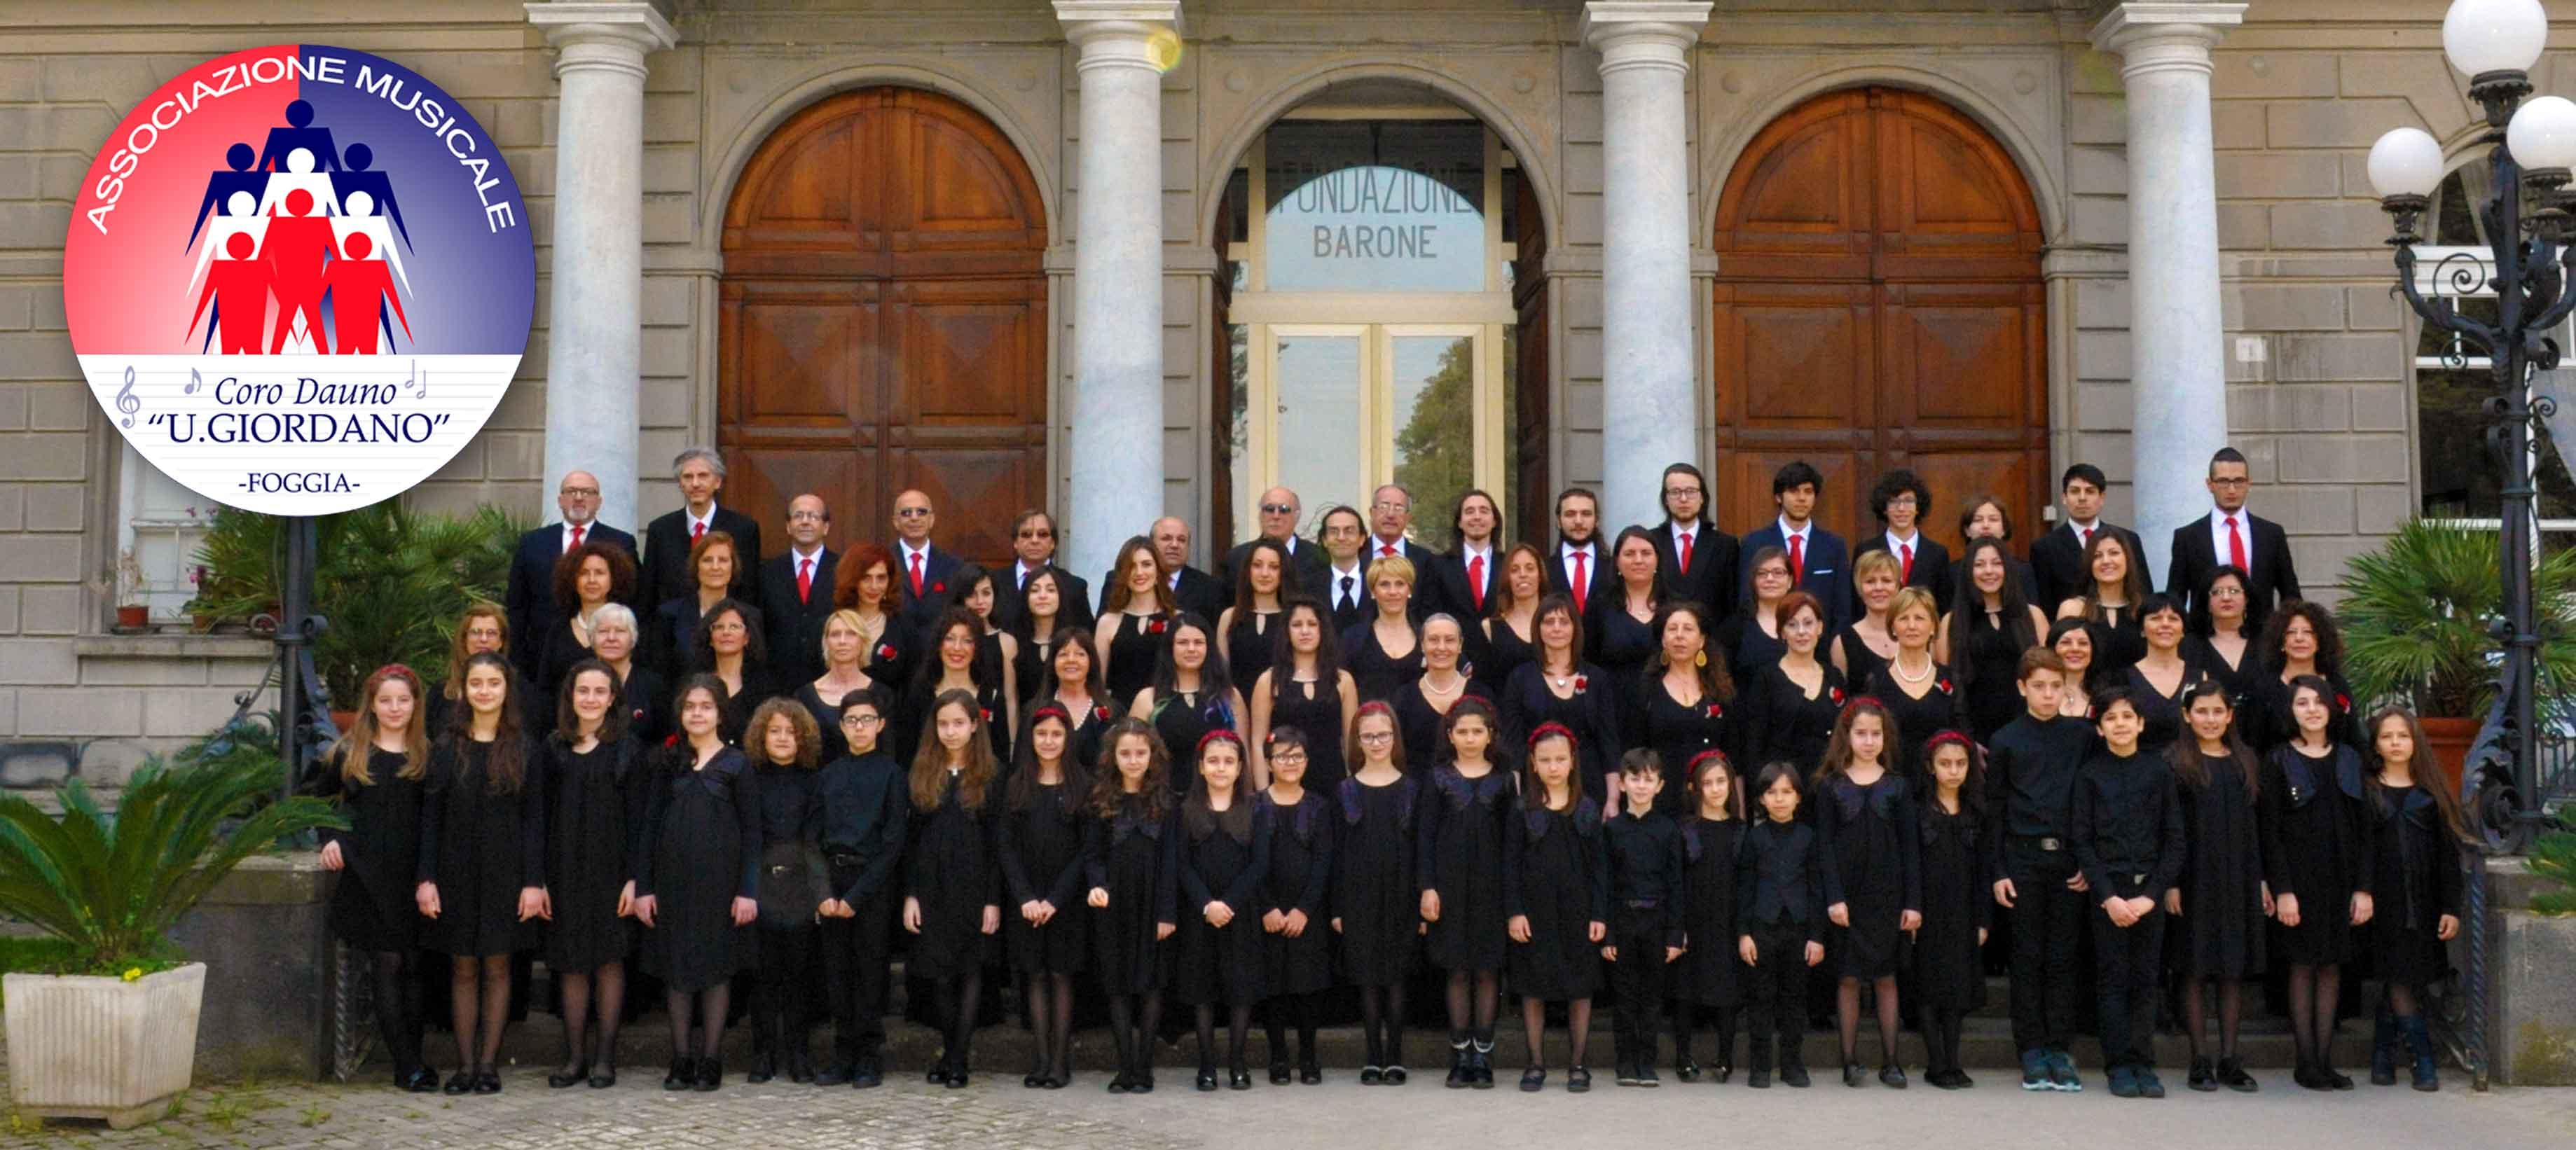 Associazione Musicale Coro Dauno Umberto Giordano